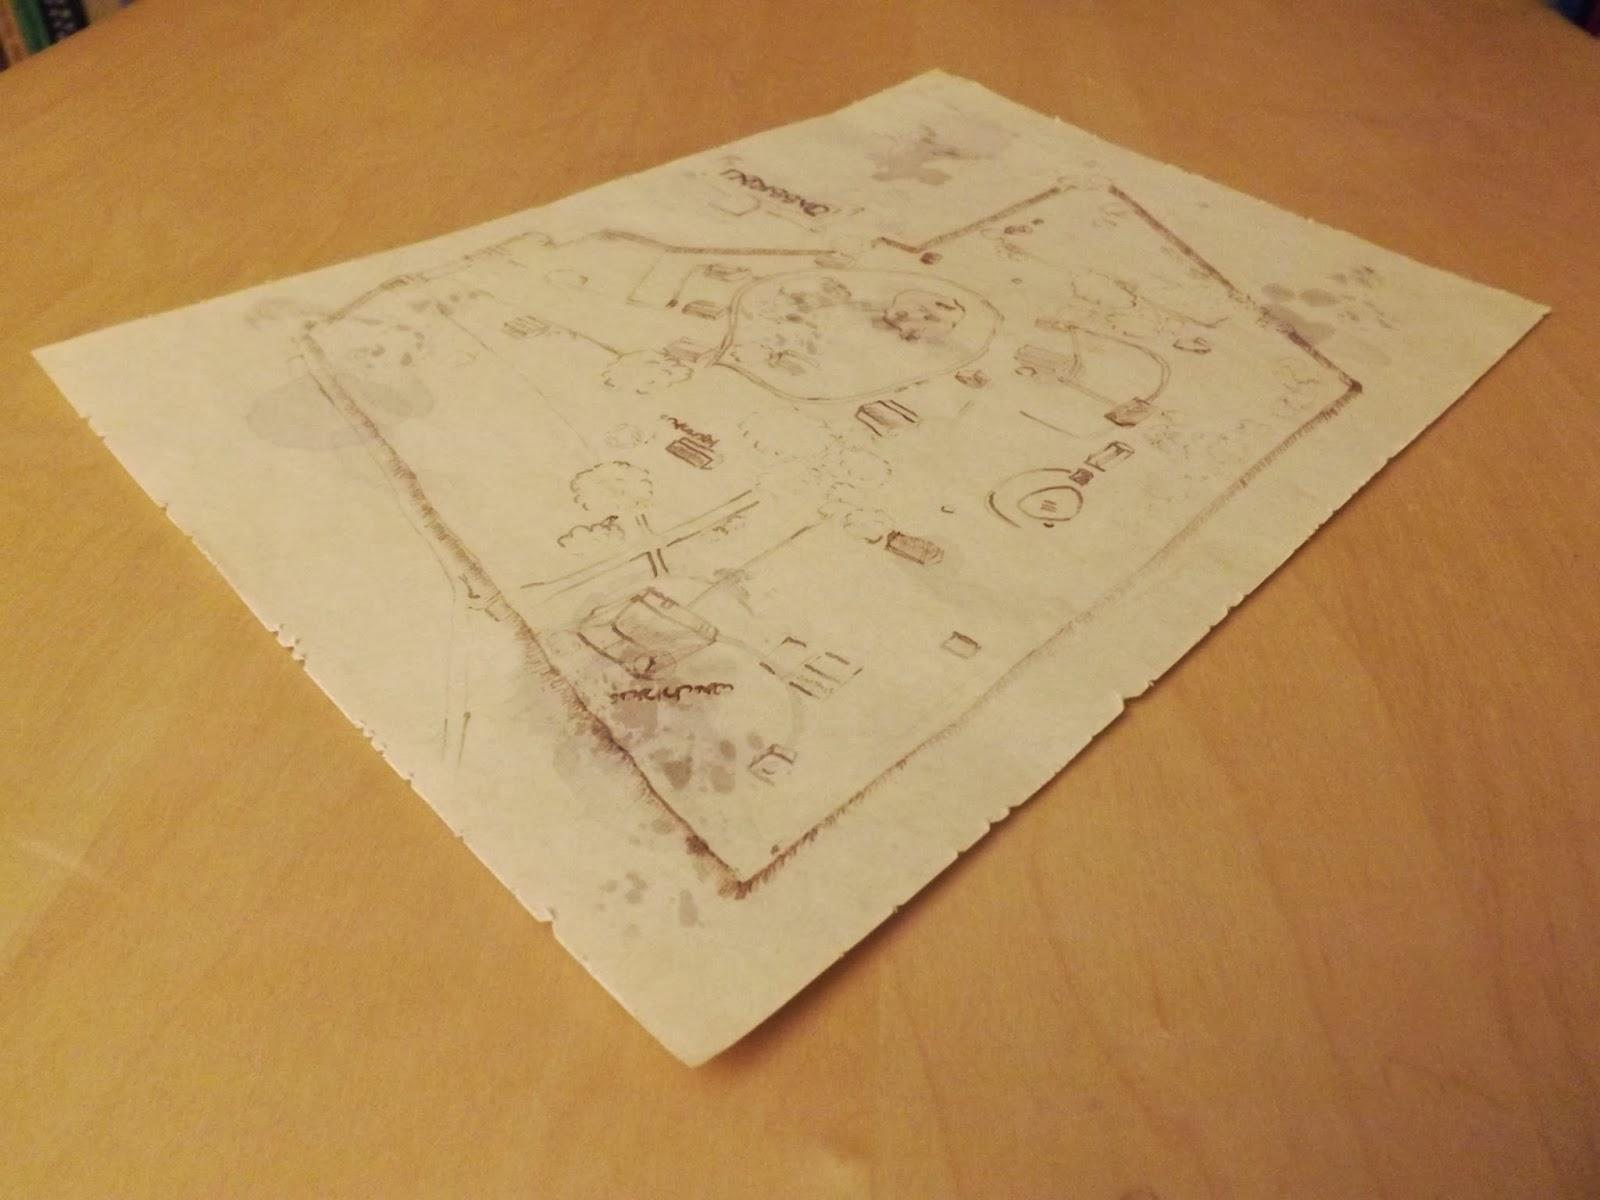 nini 39 s larp lab papier altern digital vs analog. Black Bedroom Furniture Sets. Home Design Ideas